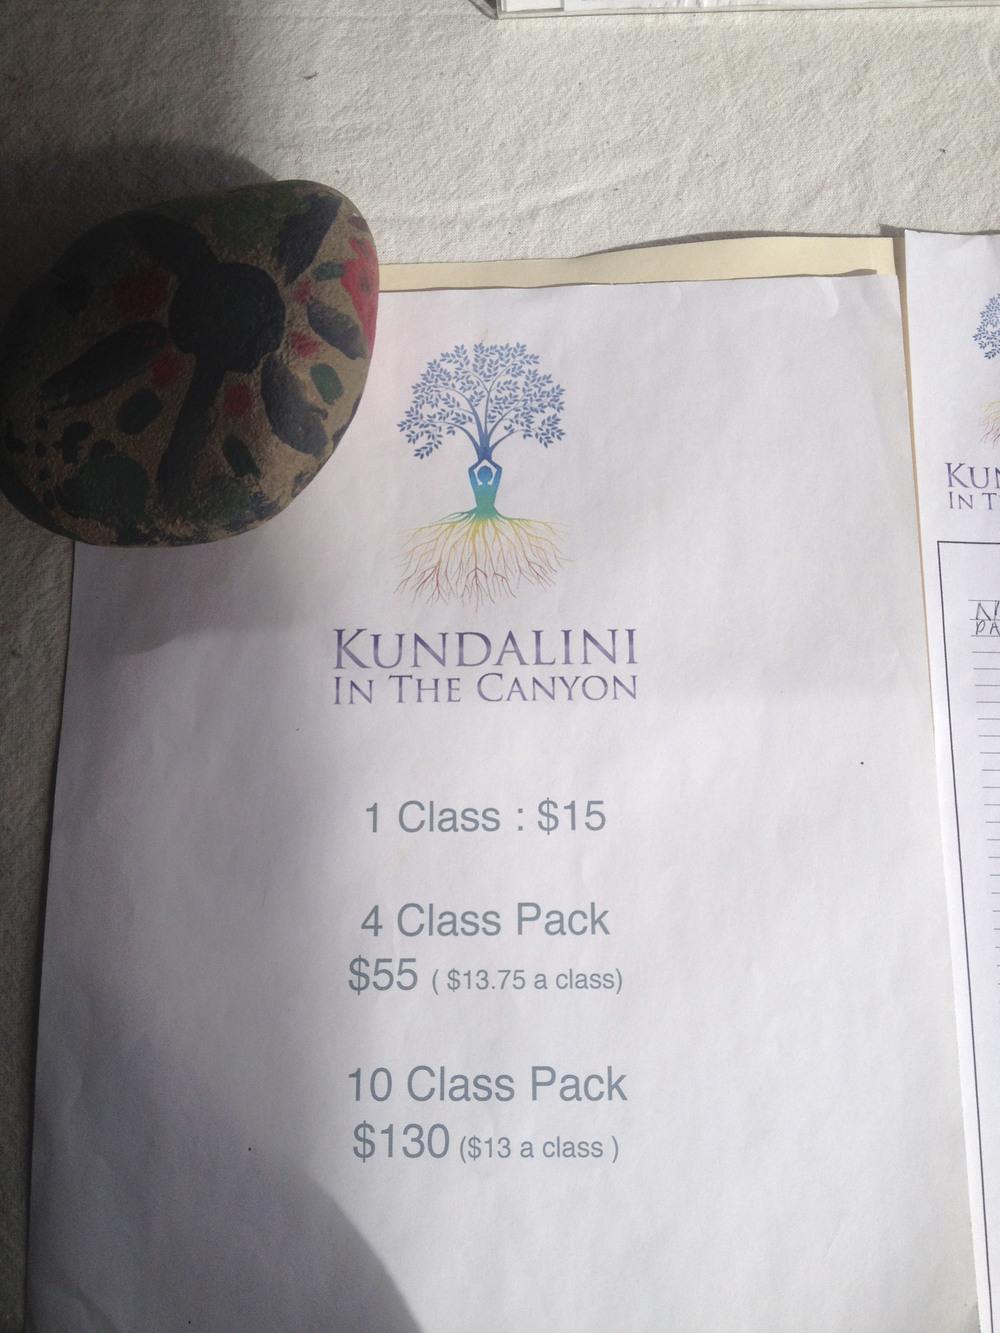 Kundalini in the Canyon2502.jpg